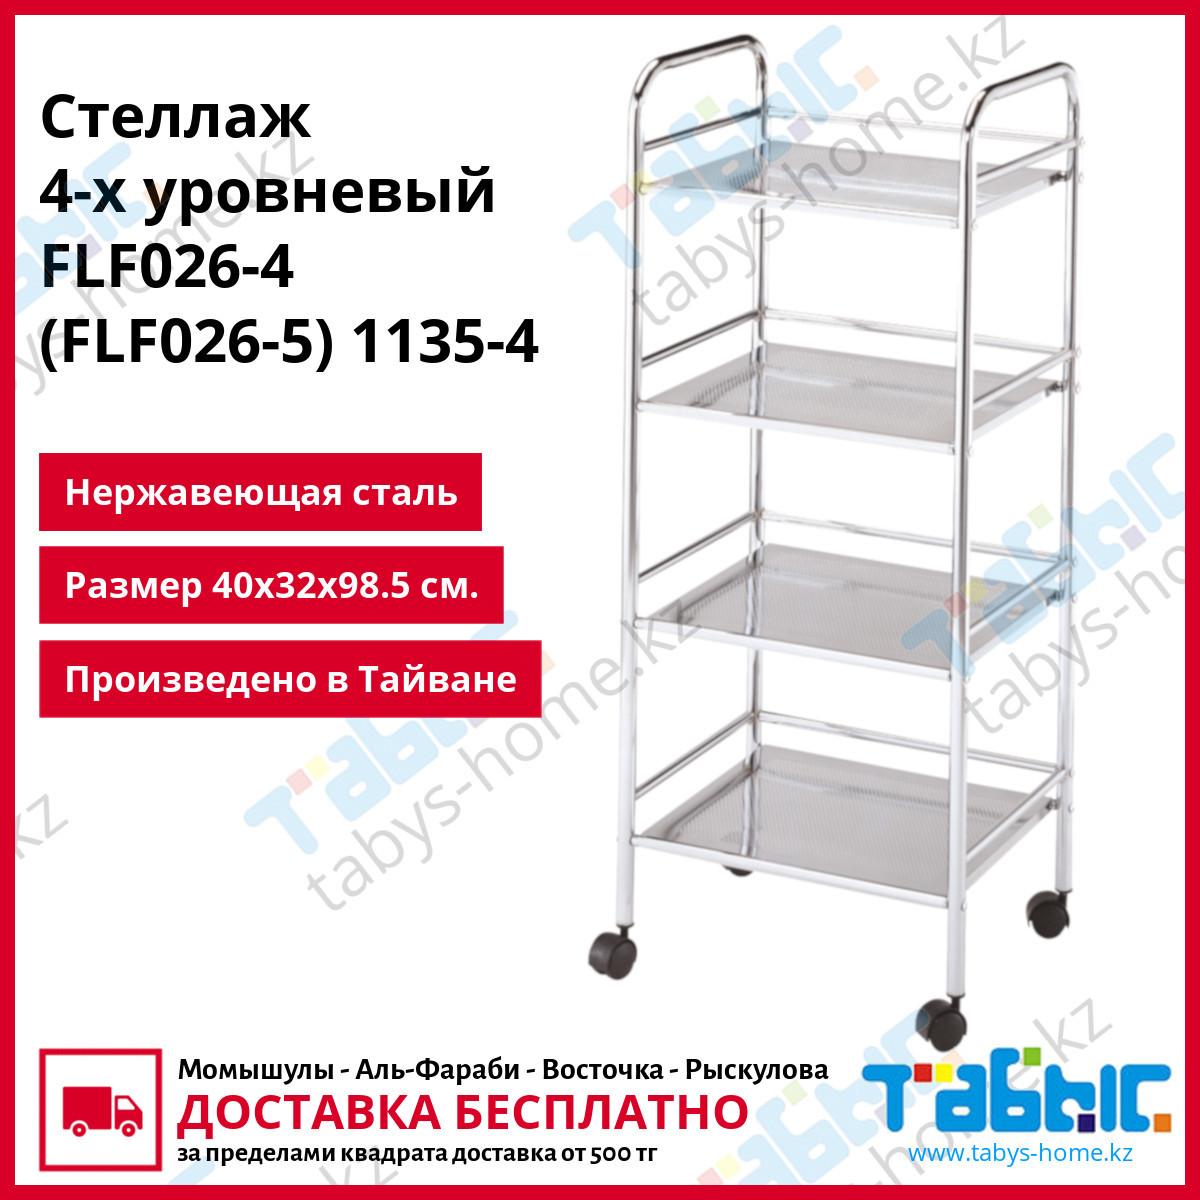 Стеллаж 4-х уровневый FLF026-4 (FLF026-5) 1135-4